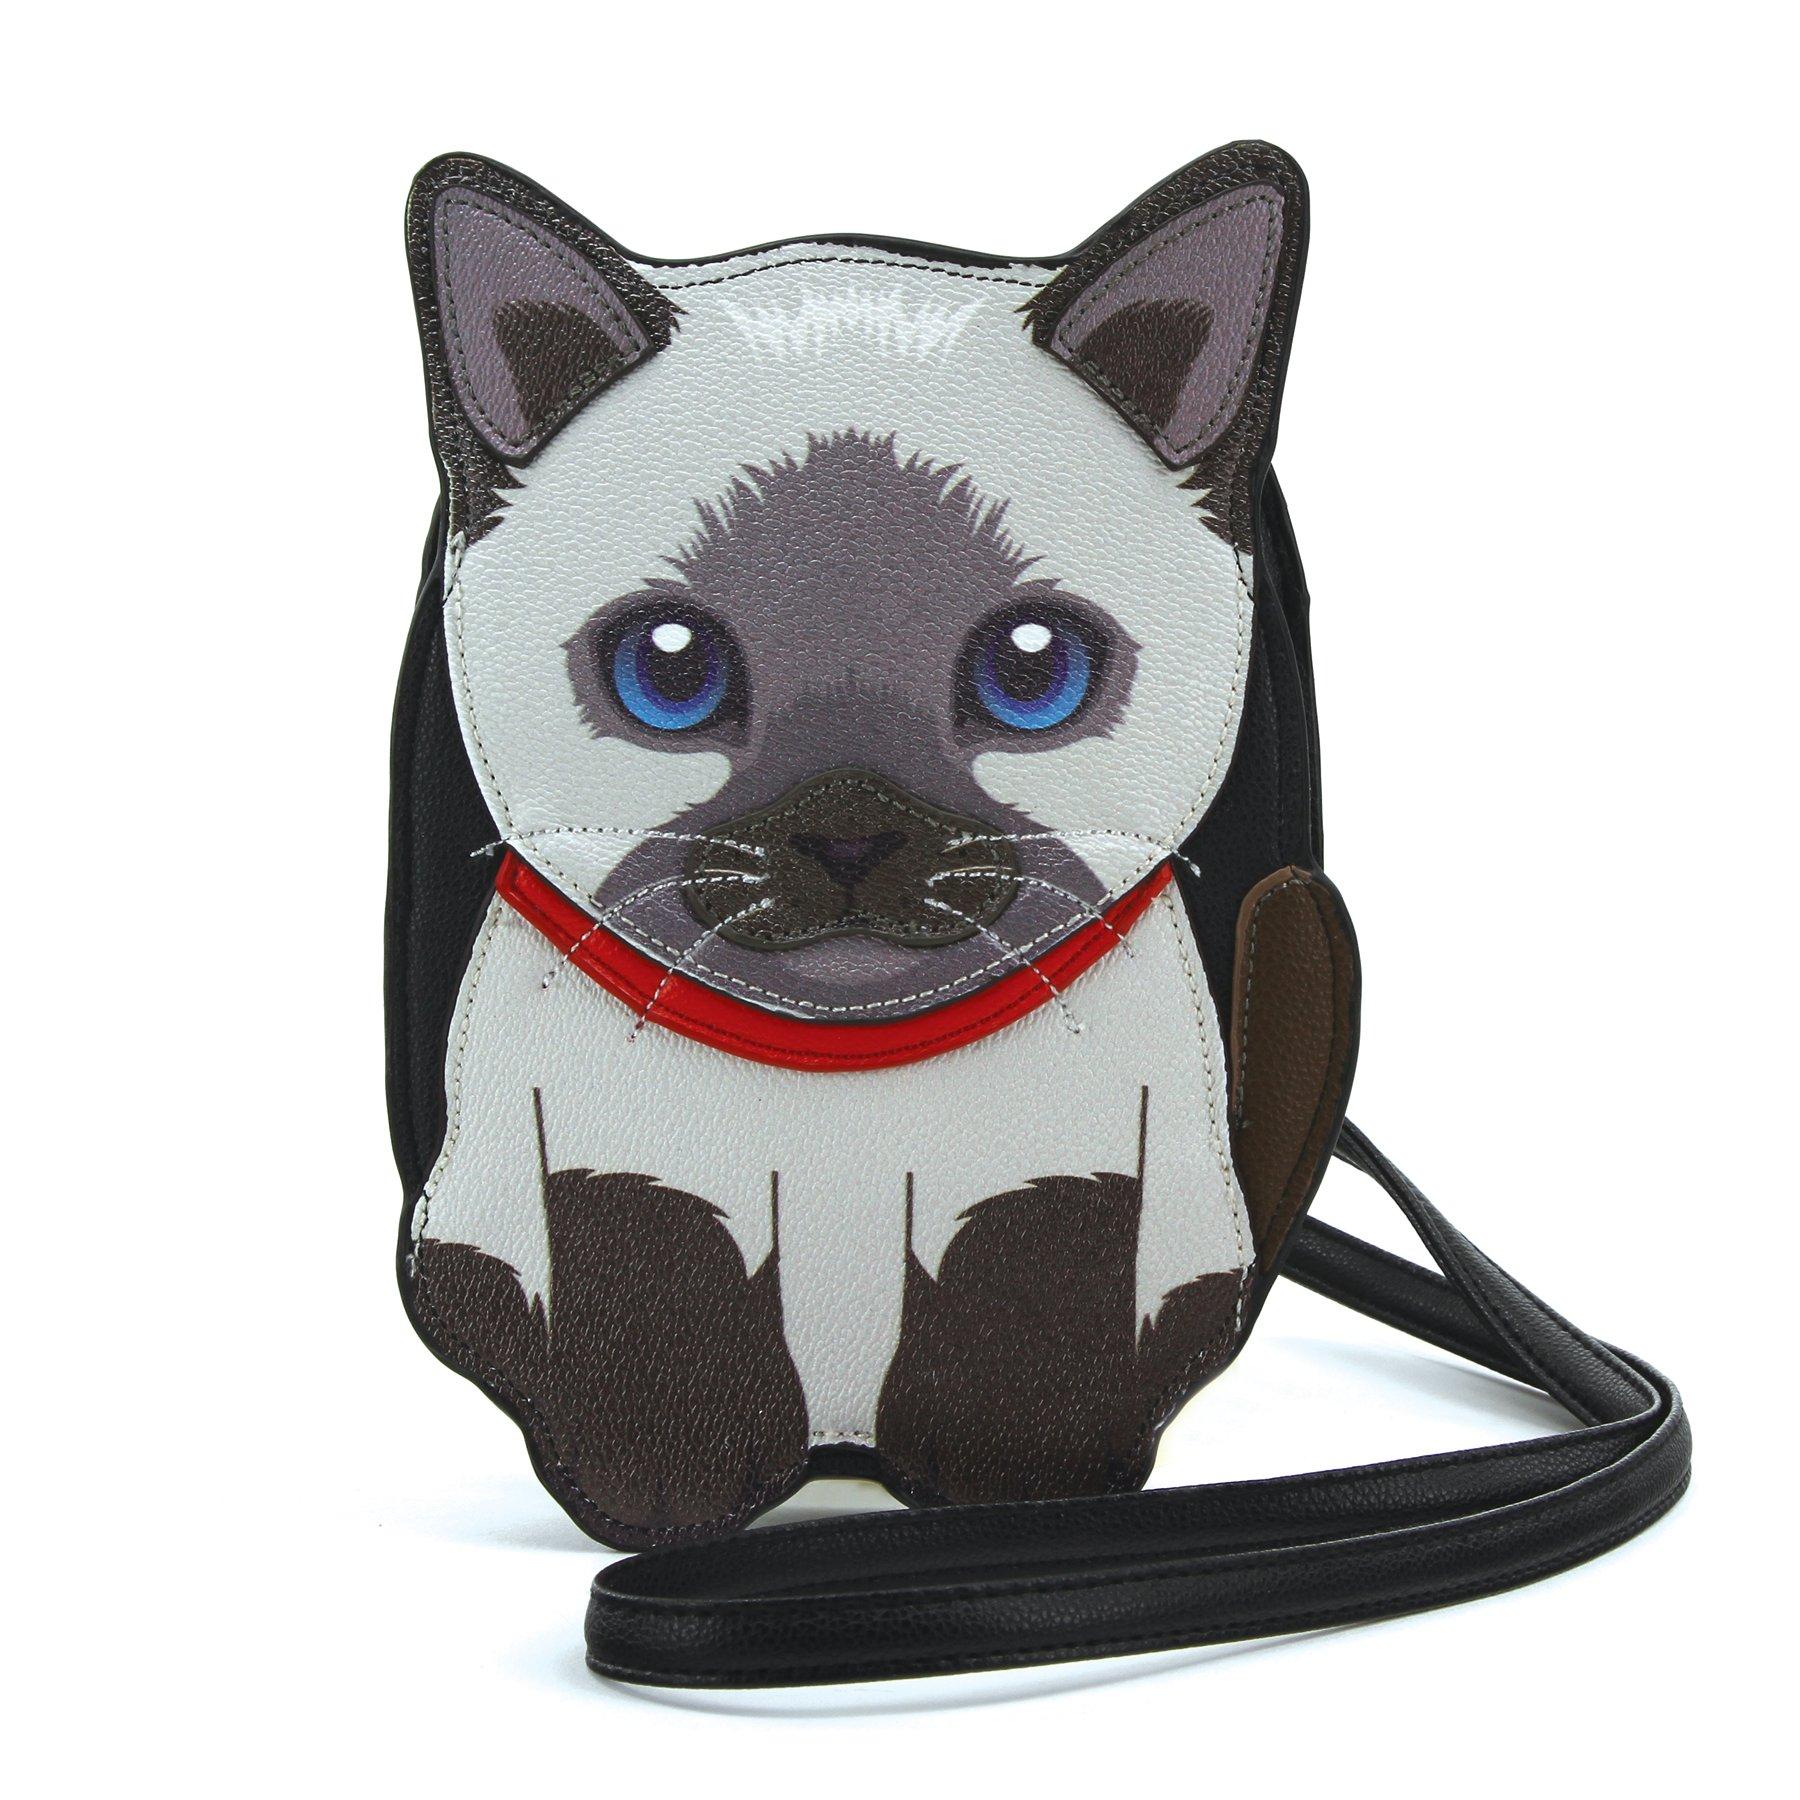 Sleepyville Critters - Siamese Cat Cross Body Bag in vinyl Material